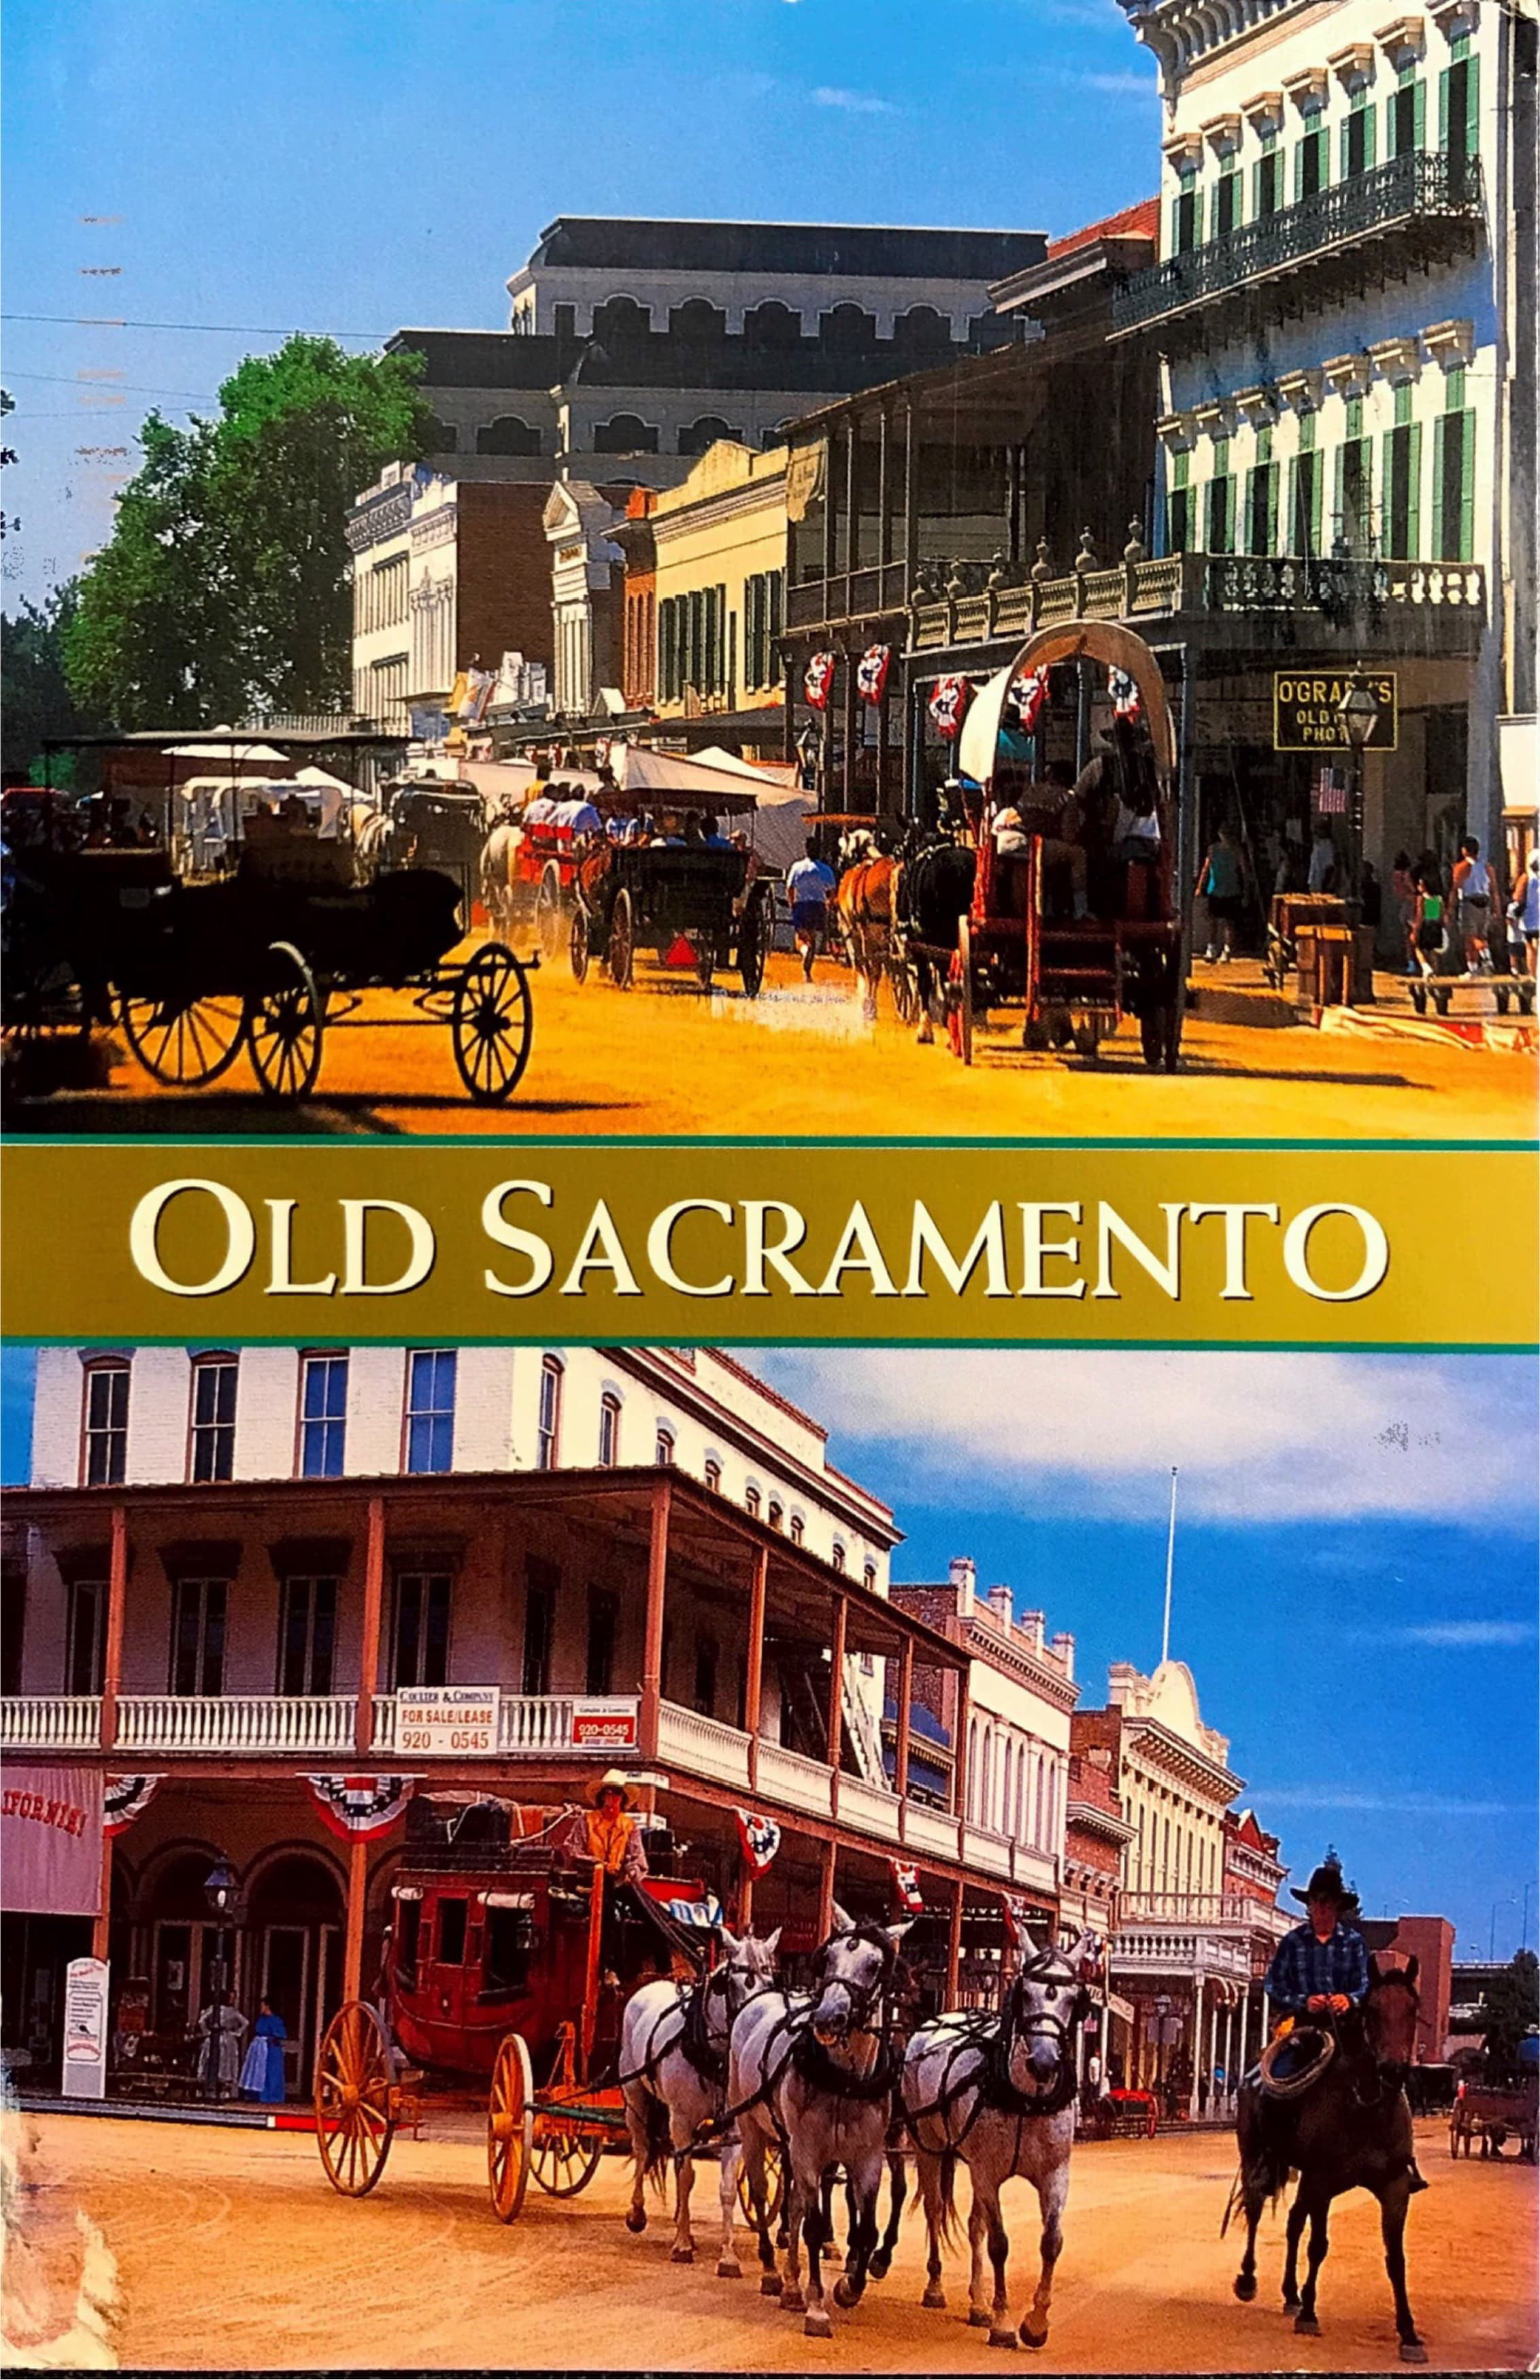 Cover of postcard from Sarah Mancina (WIPAC, USA)